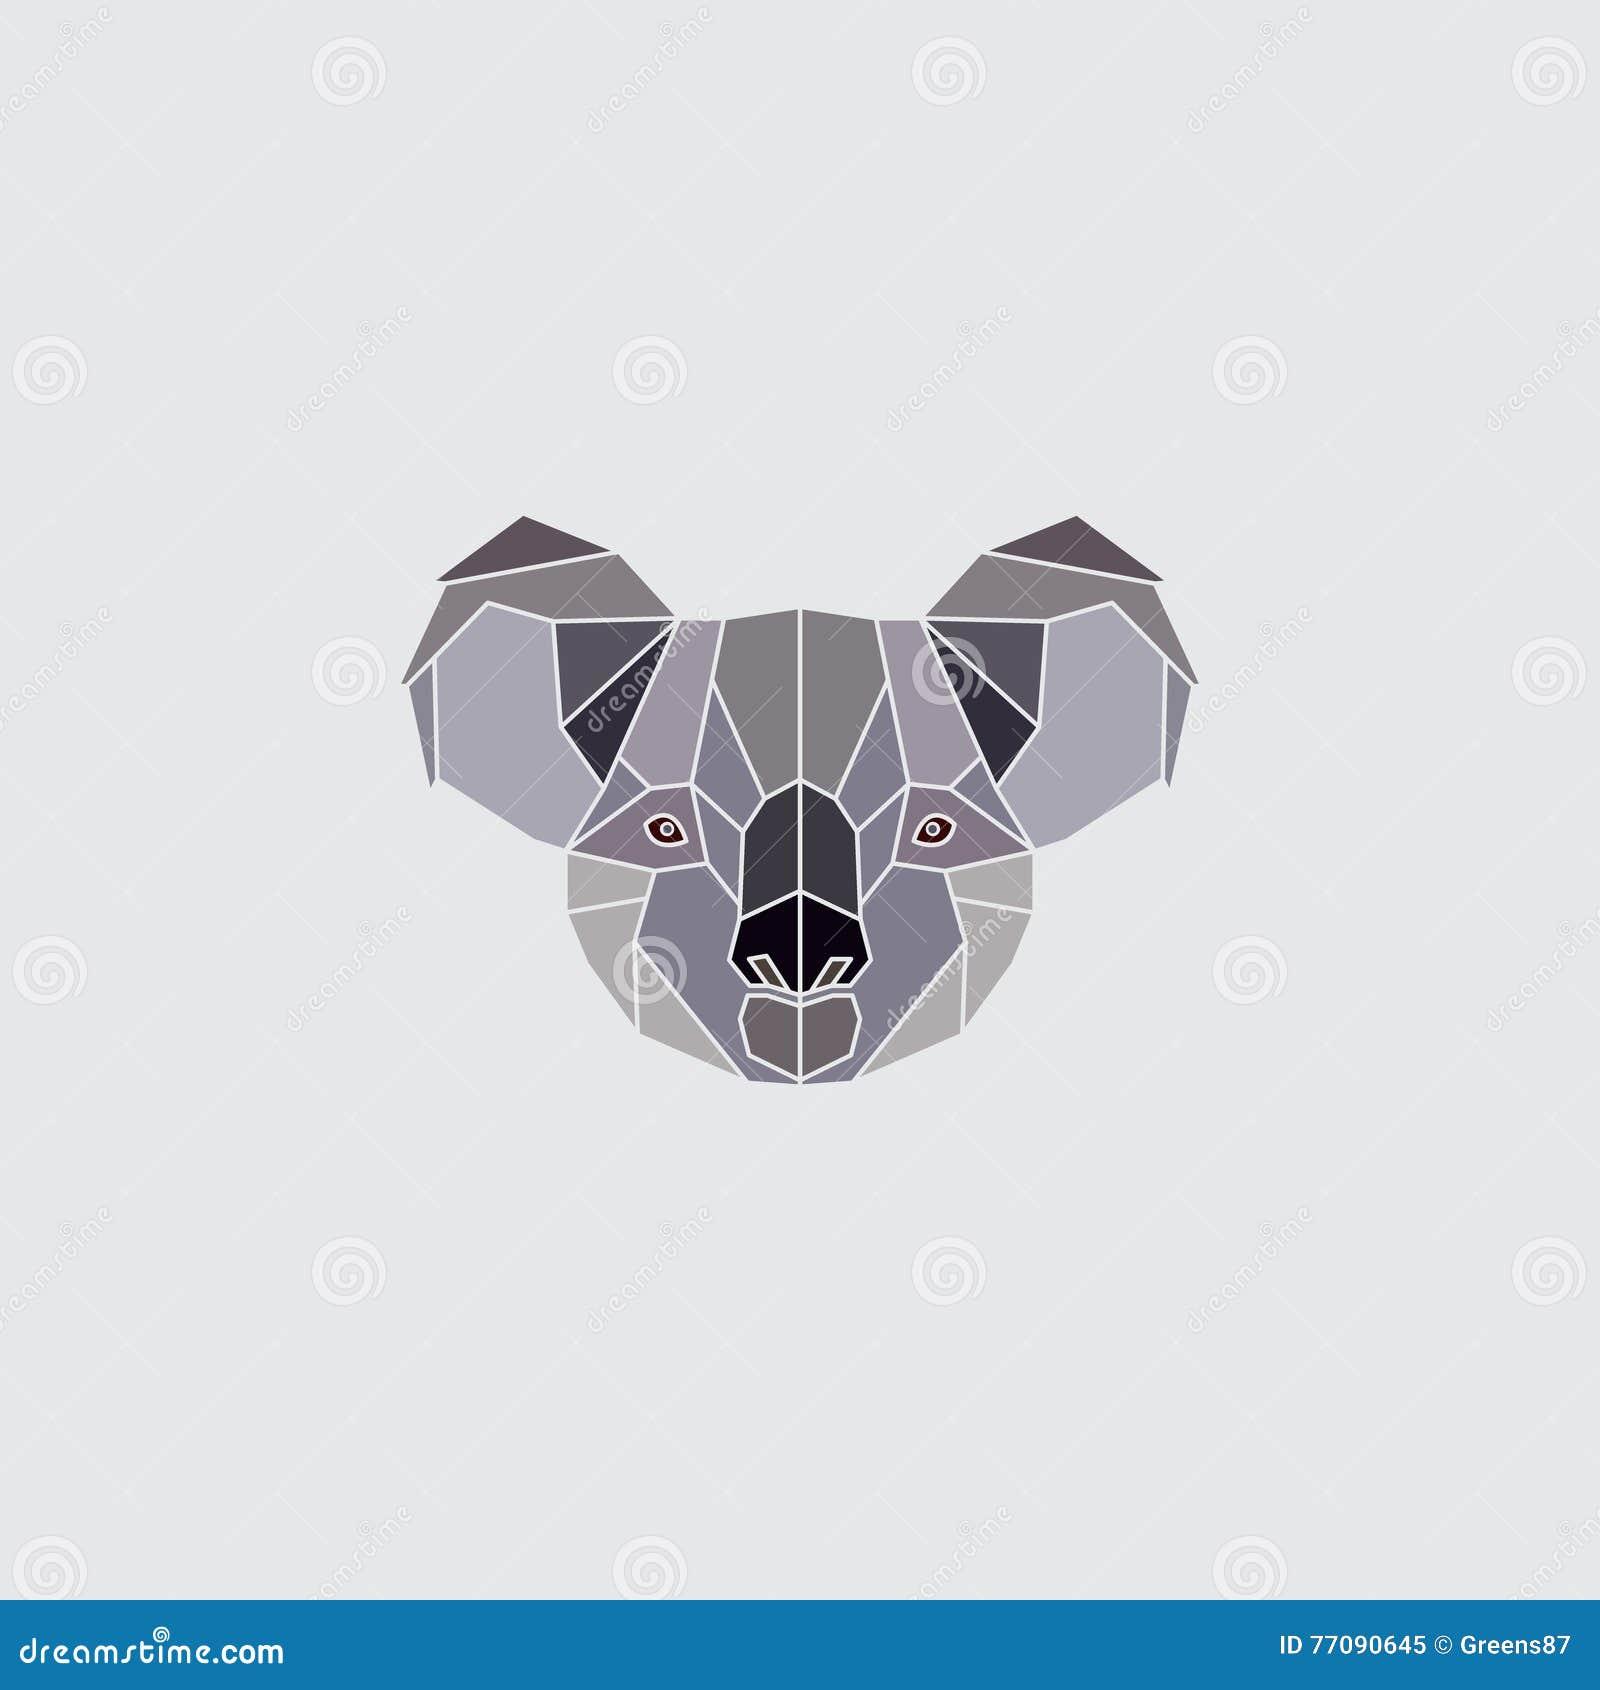 Koala head logo stock vector. Illustration of geometric ...